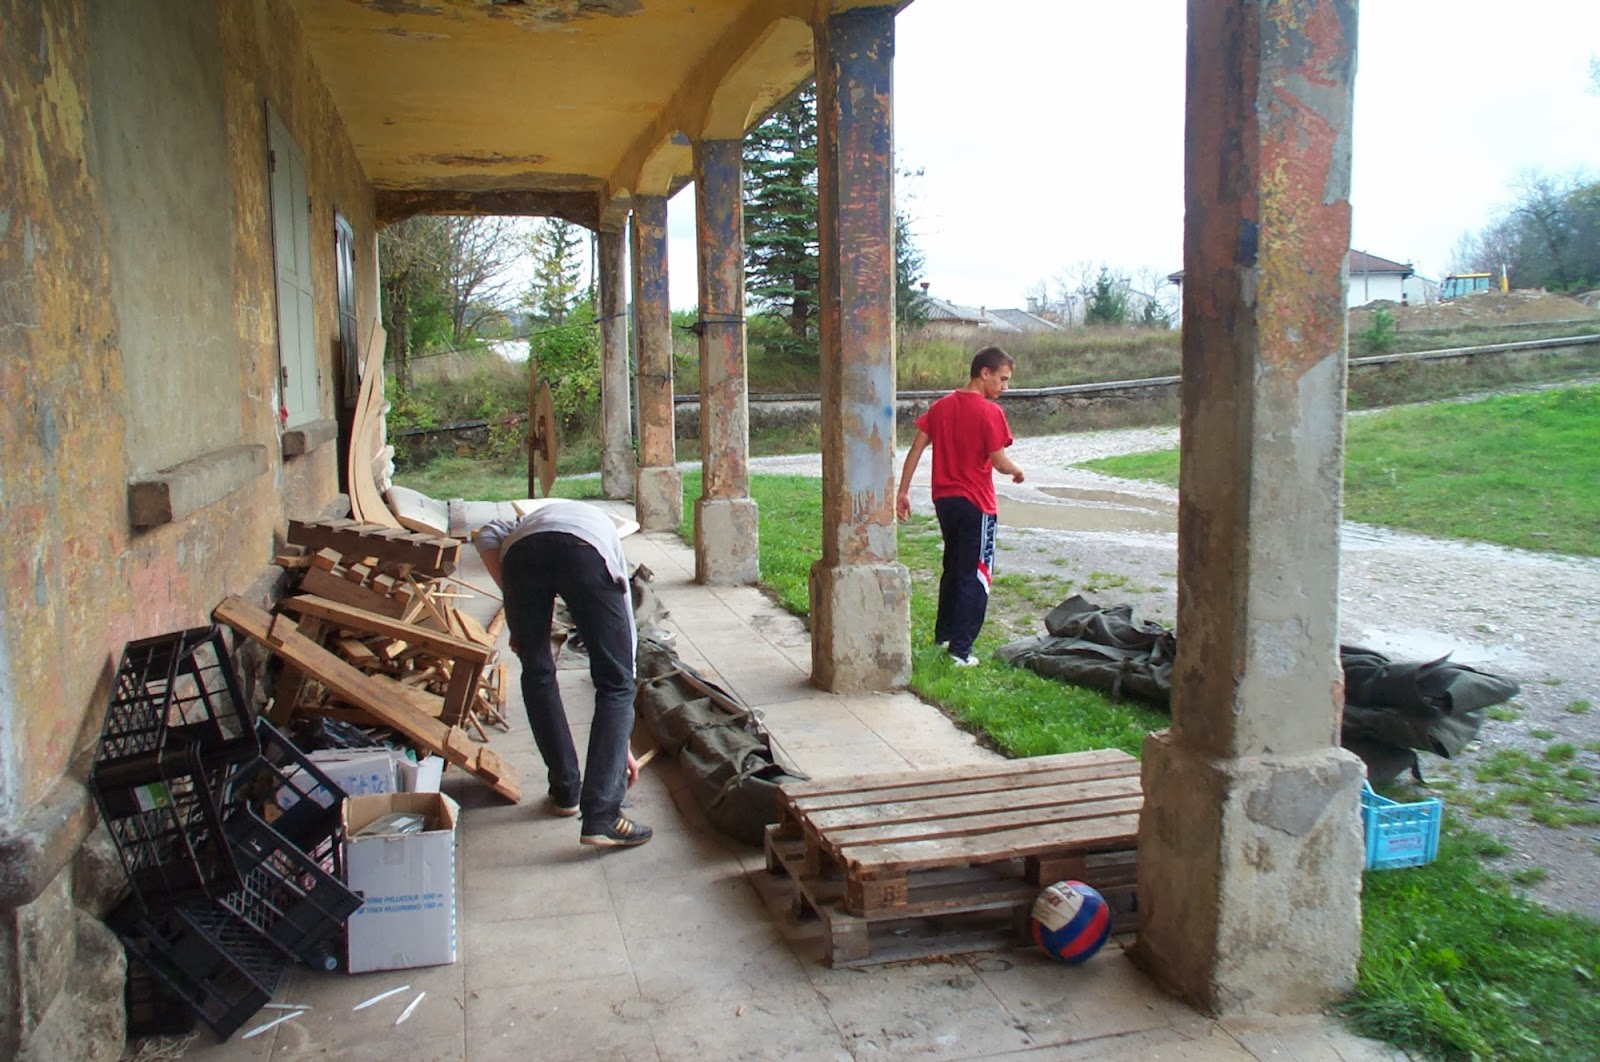 Inventura skladišča, Ilirska Bistrica 2004 - Inventura%2Bskladis%25CC%258Cc%25CC%258Ca%2B2004%2B001.jpg